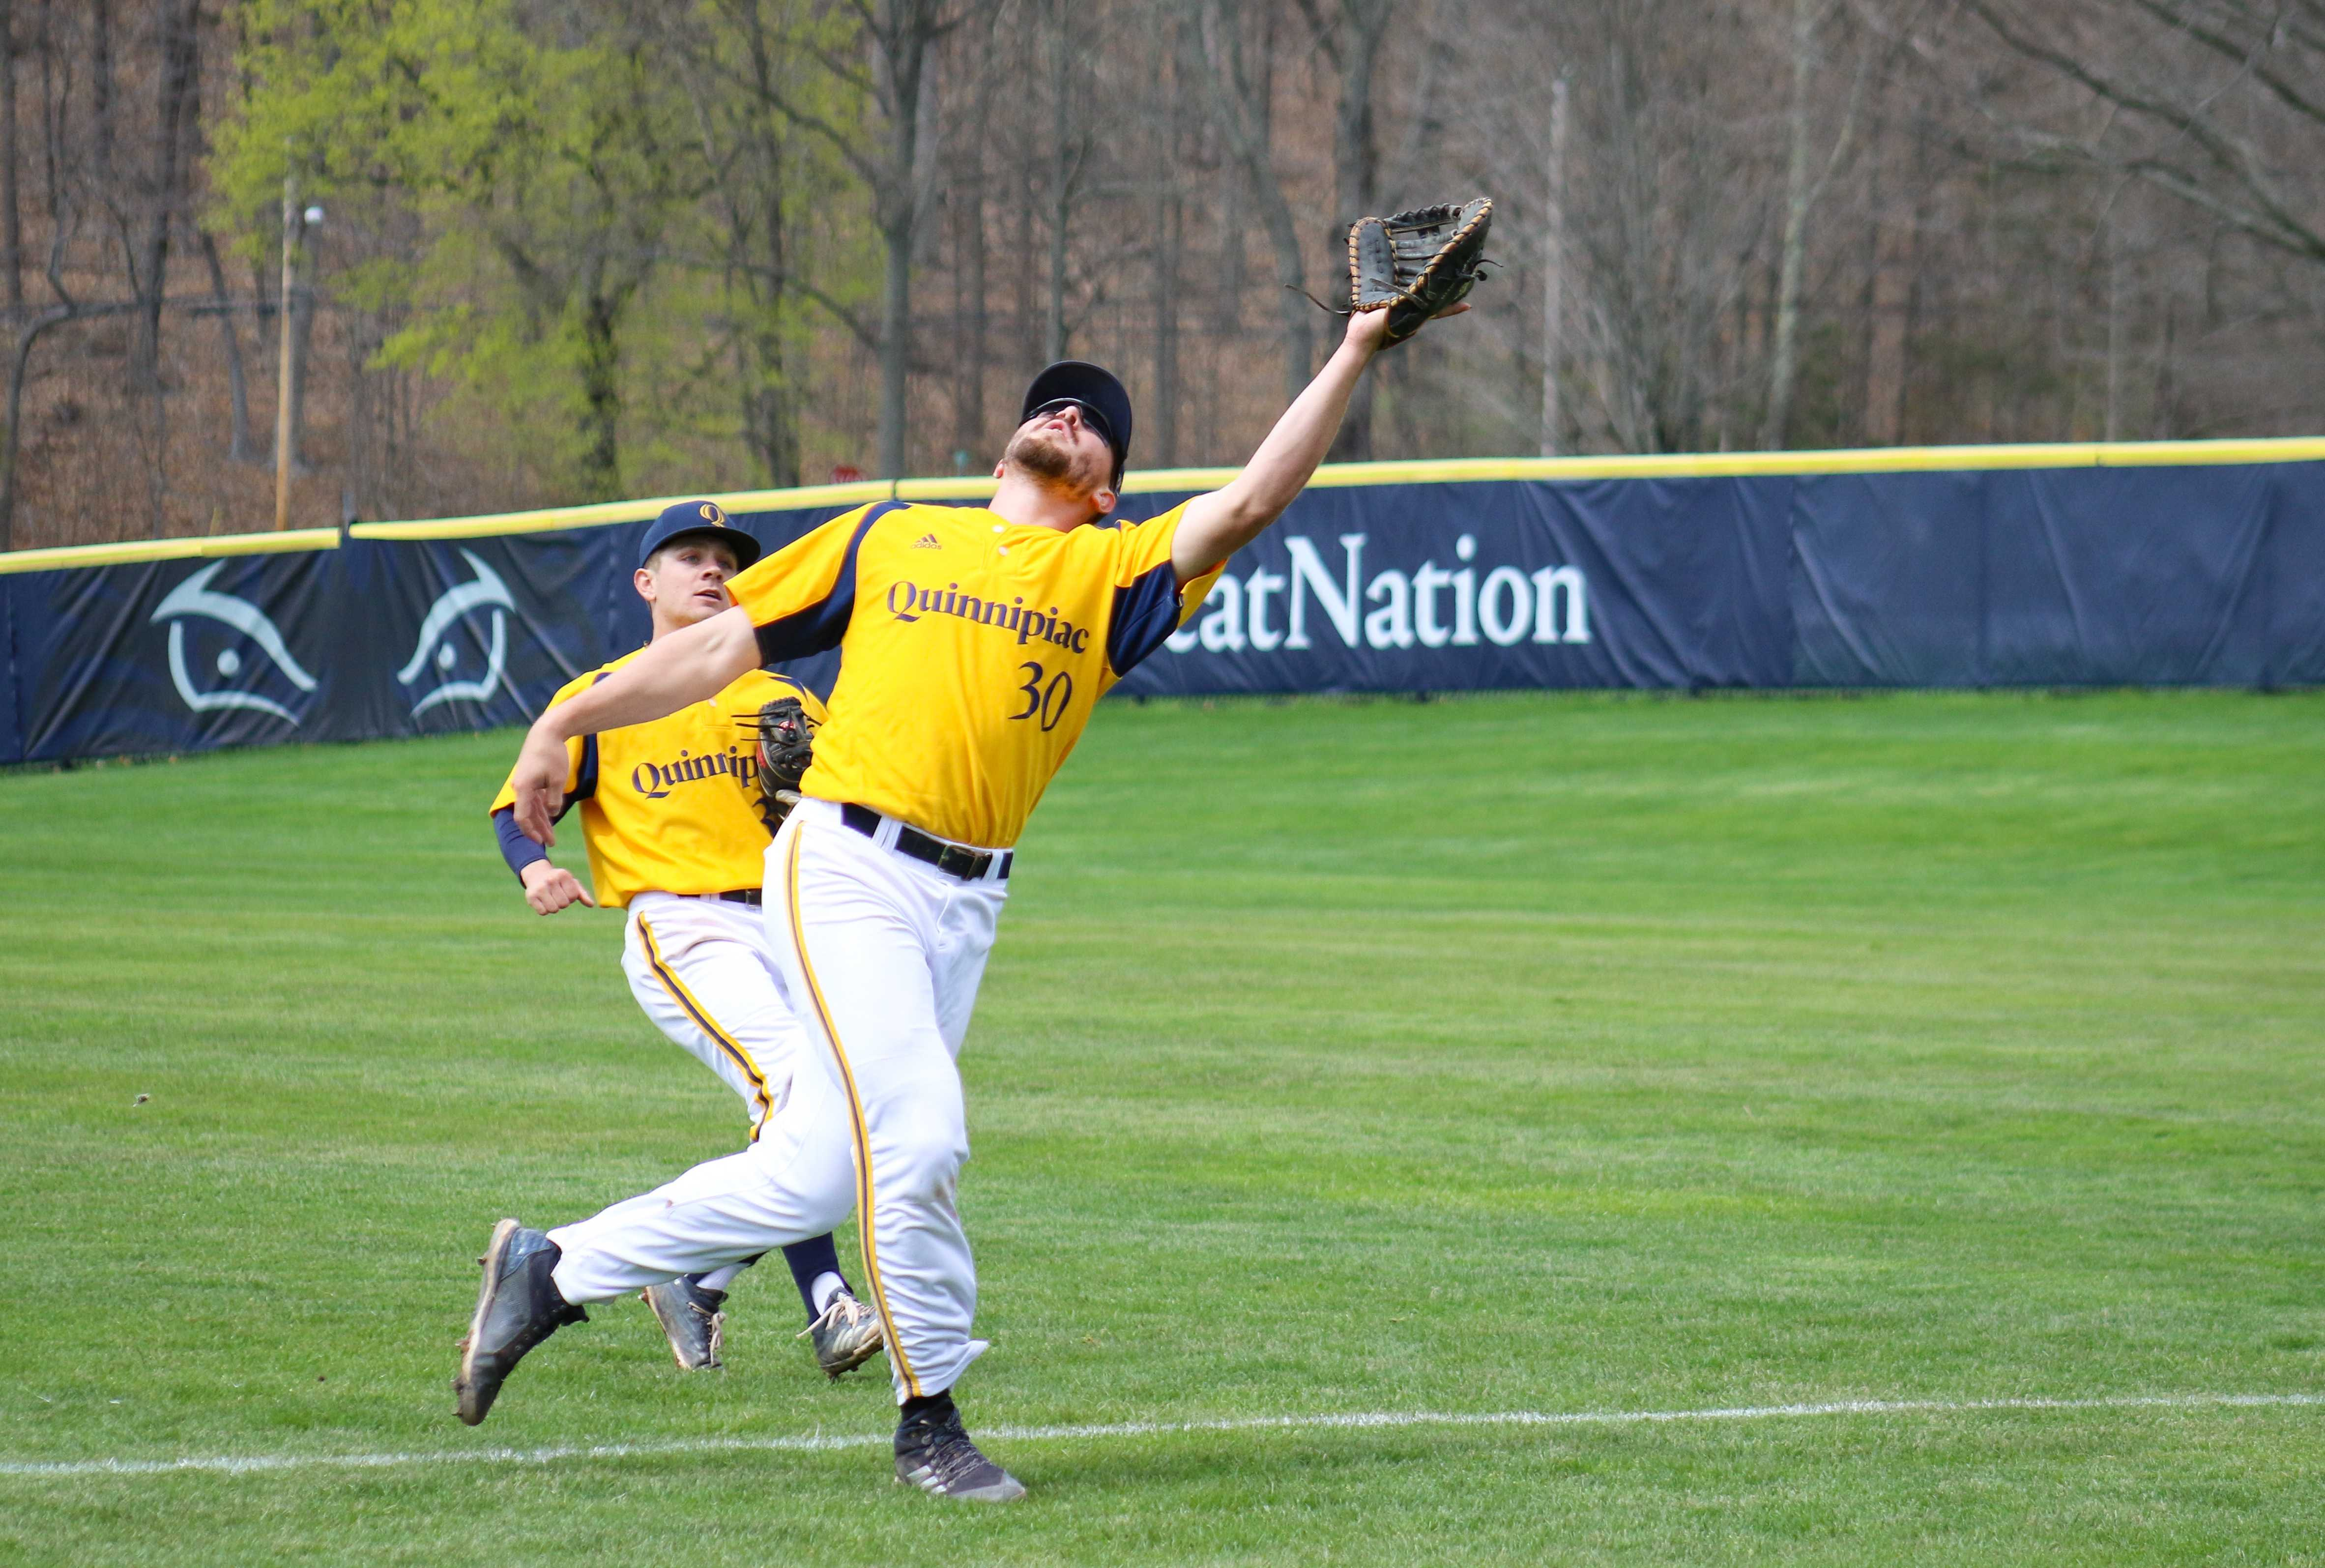 Quinnipiac baseball drops series to Iona after 9-4 loss